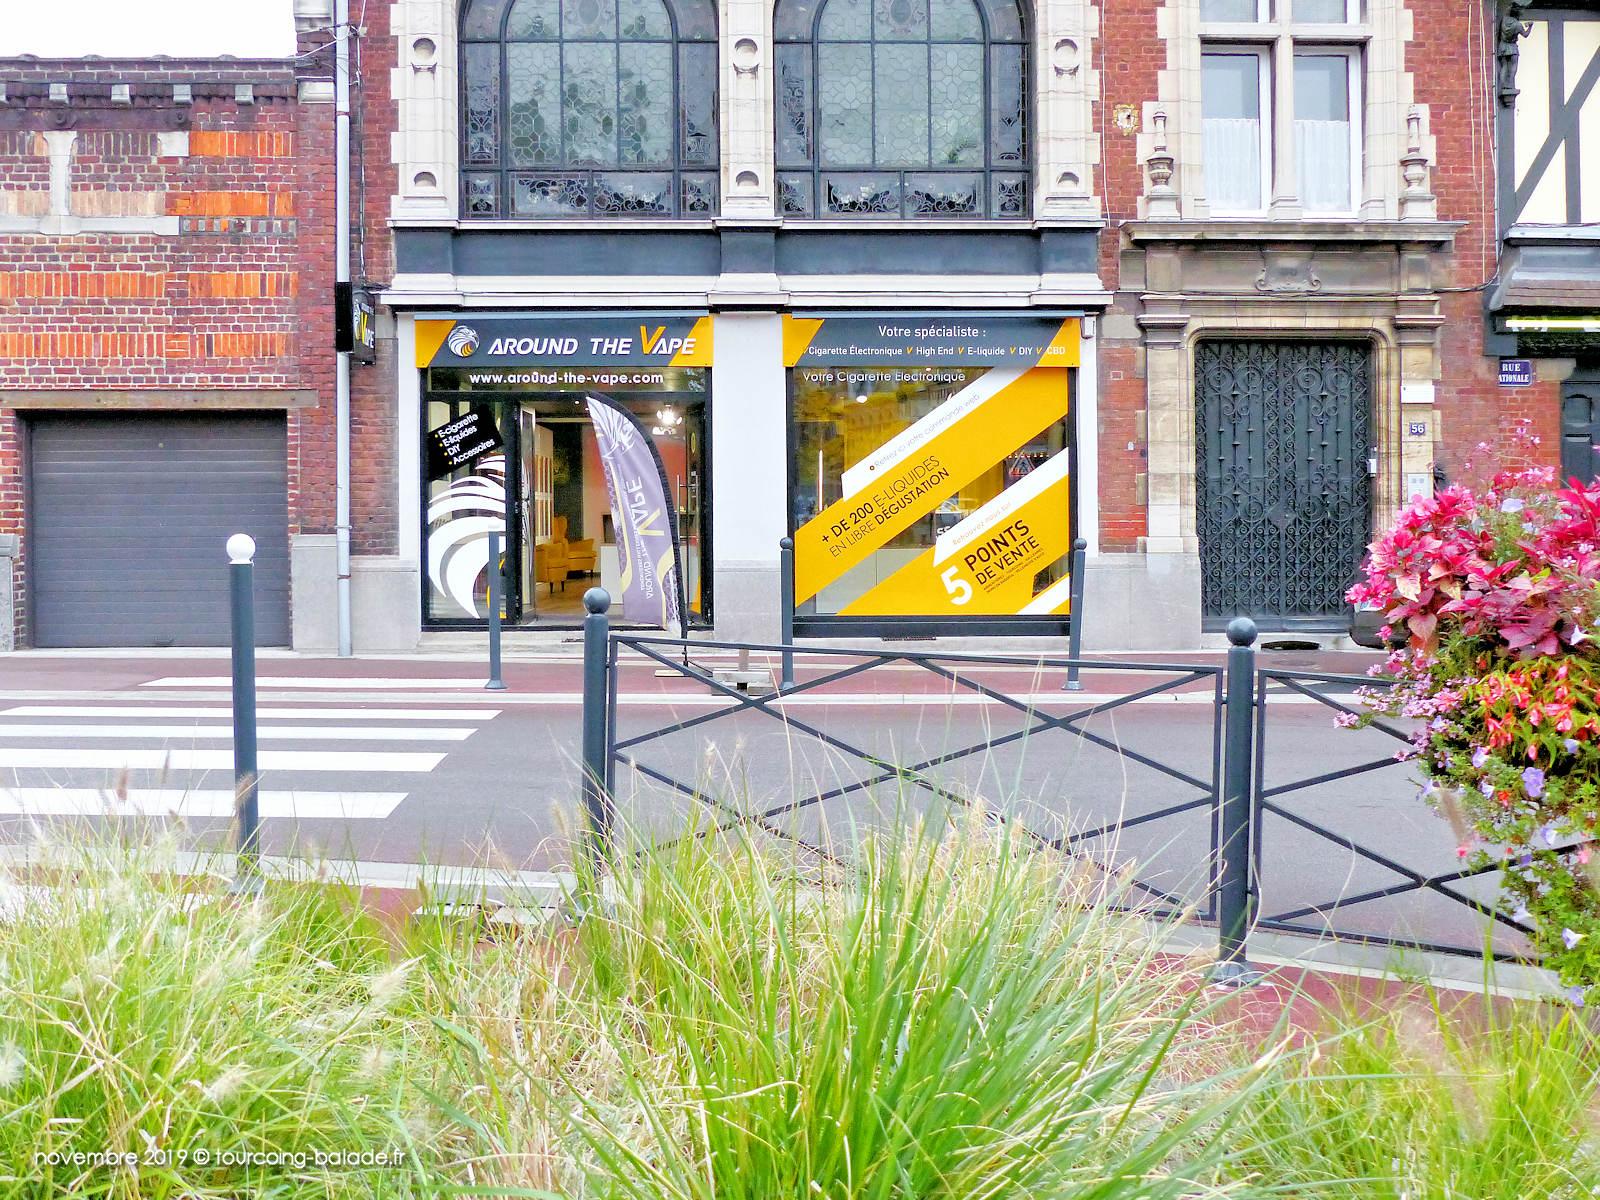 Vapotage Around The Vape - Tourcoing, 2019